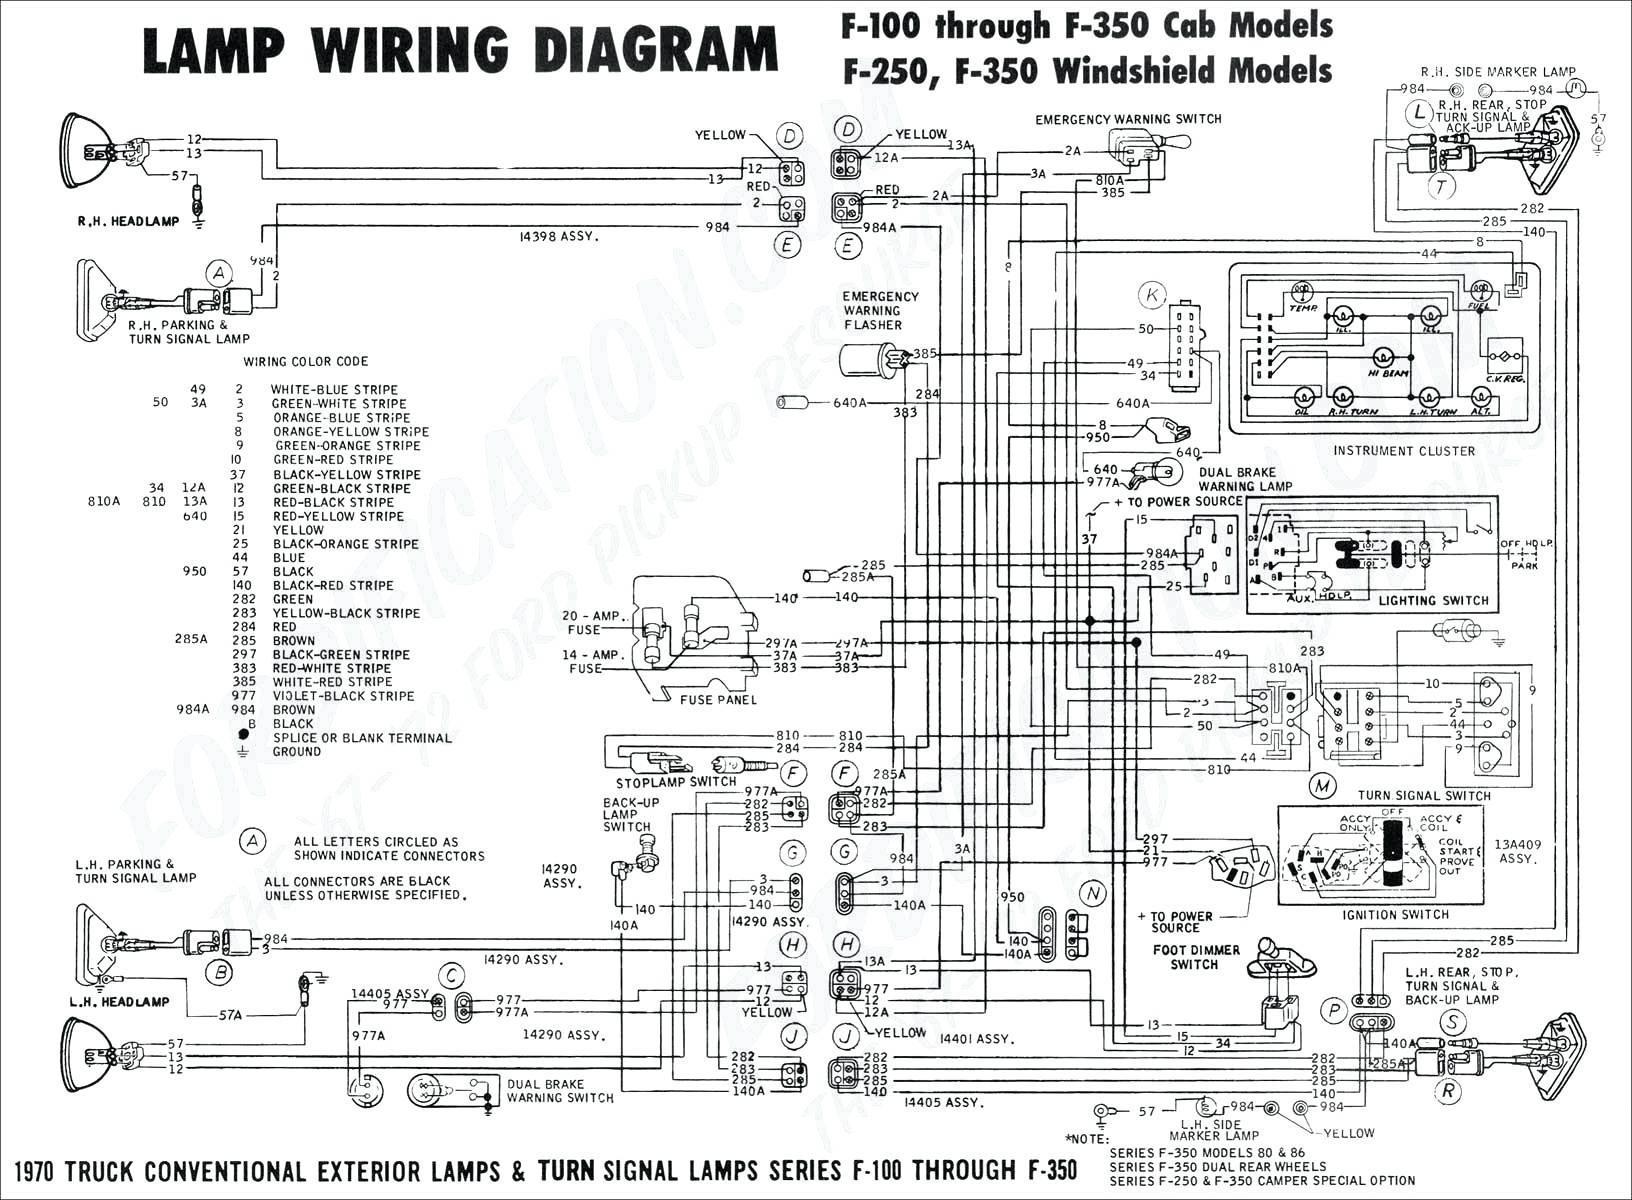 Xbox Dvd Wiring Diagrams Schema Wiring Diagram Xbox Dvd Wiring Diagrams Source